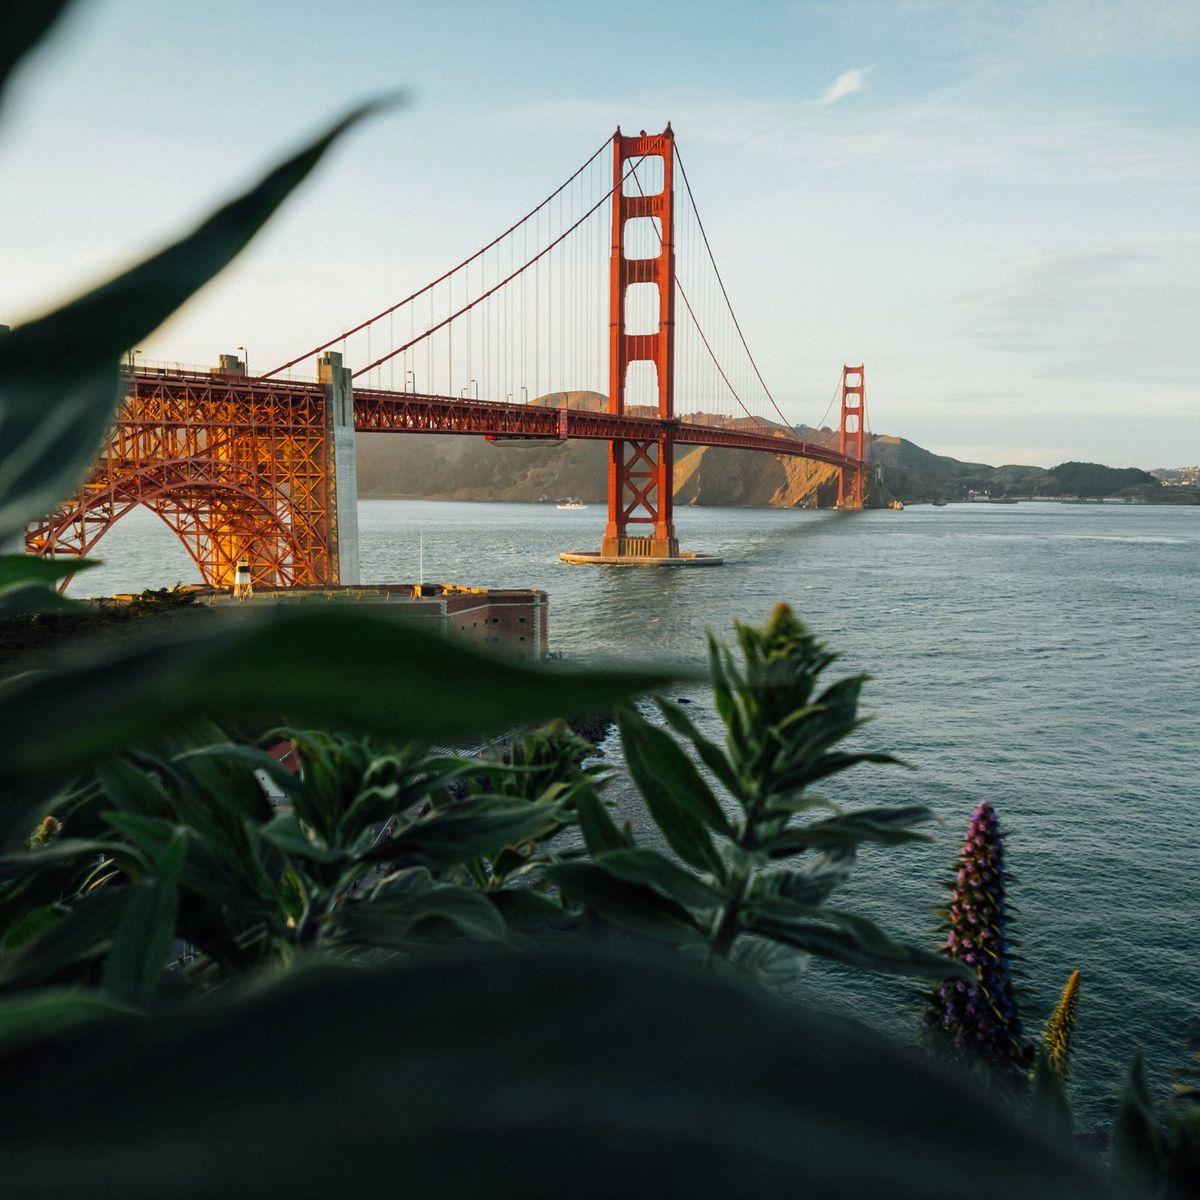 San Francisco Charter Bus Rental